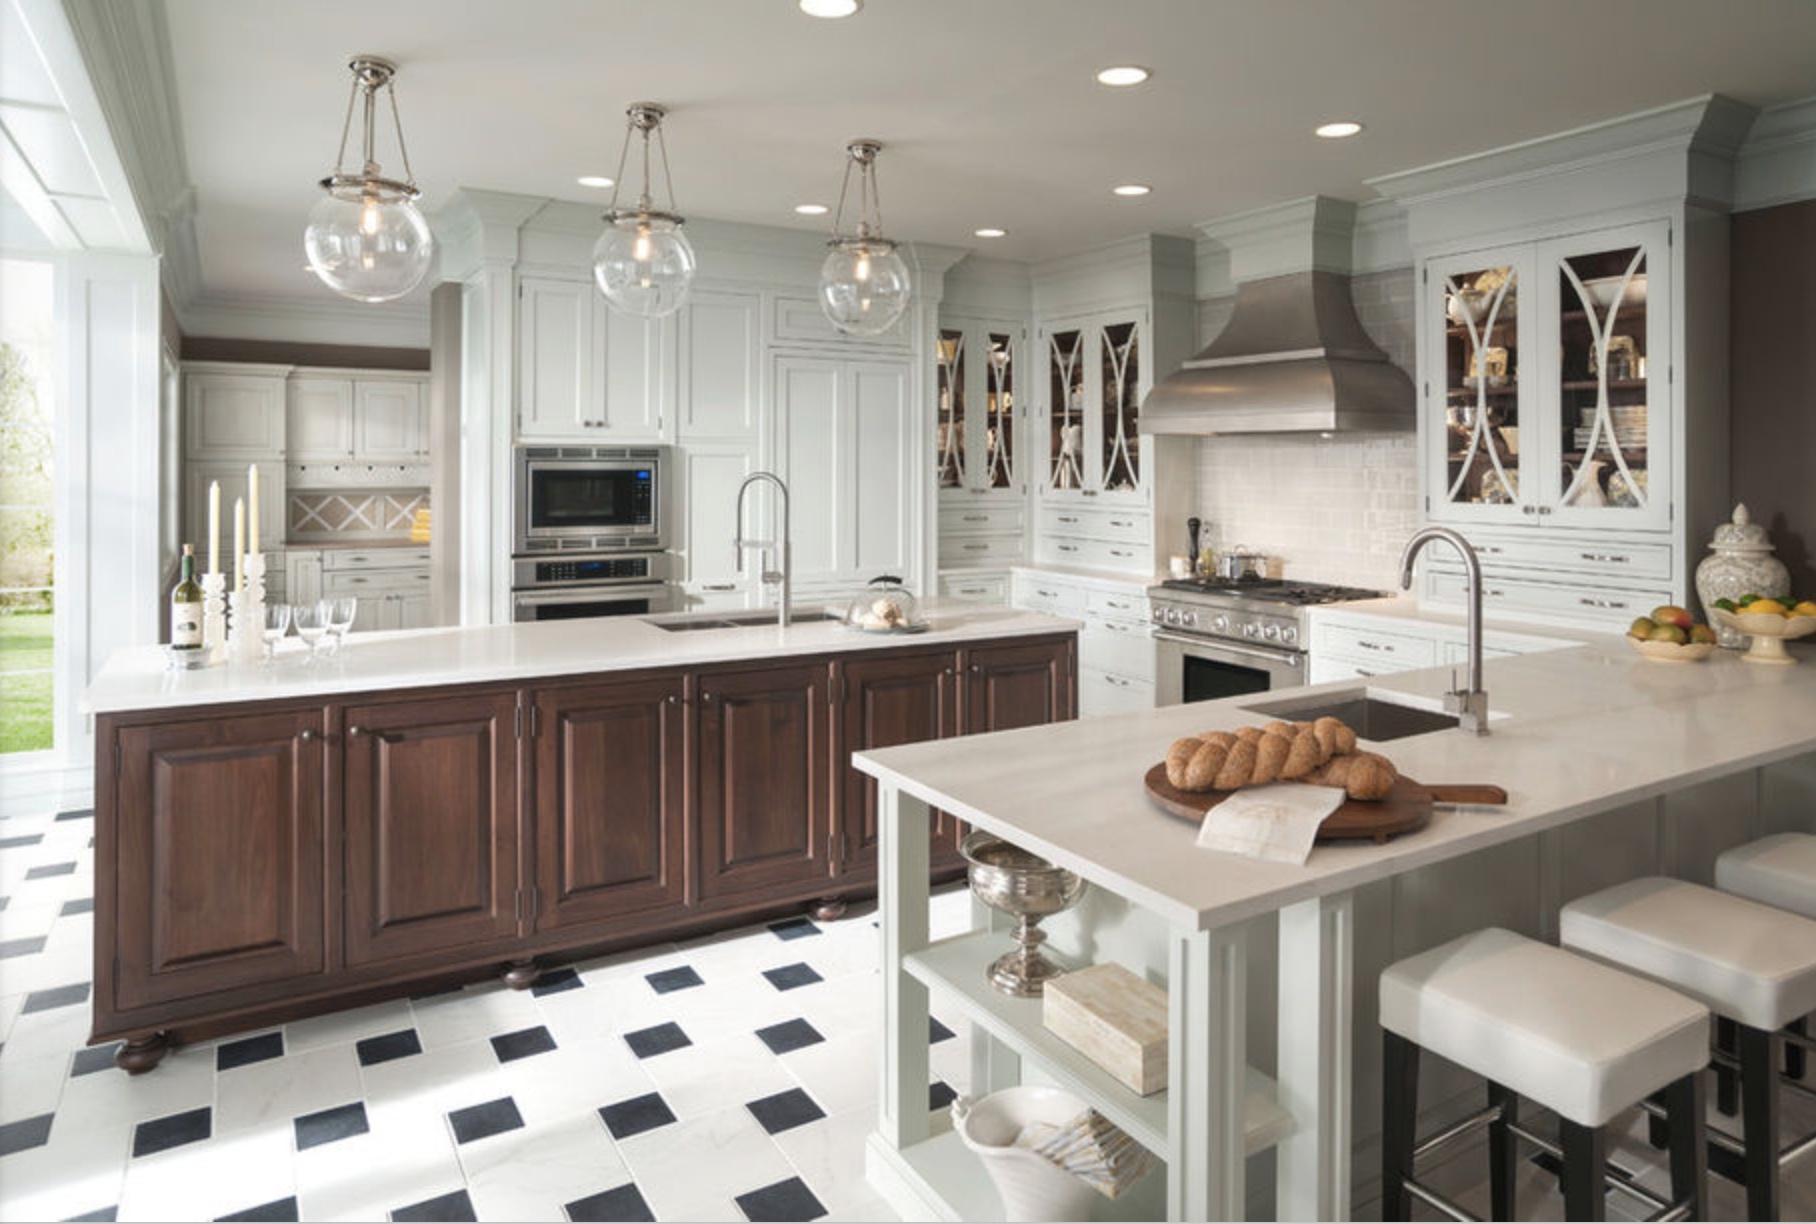 Top 10 Kitchens 2017